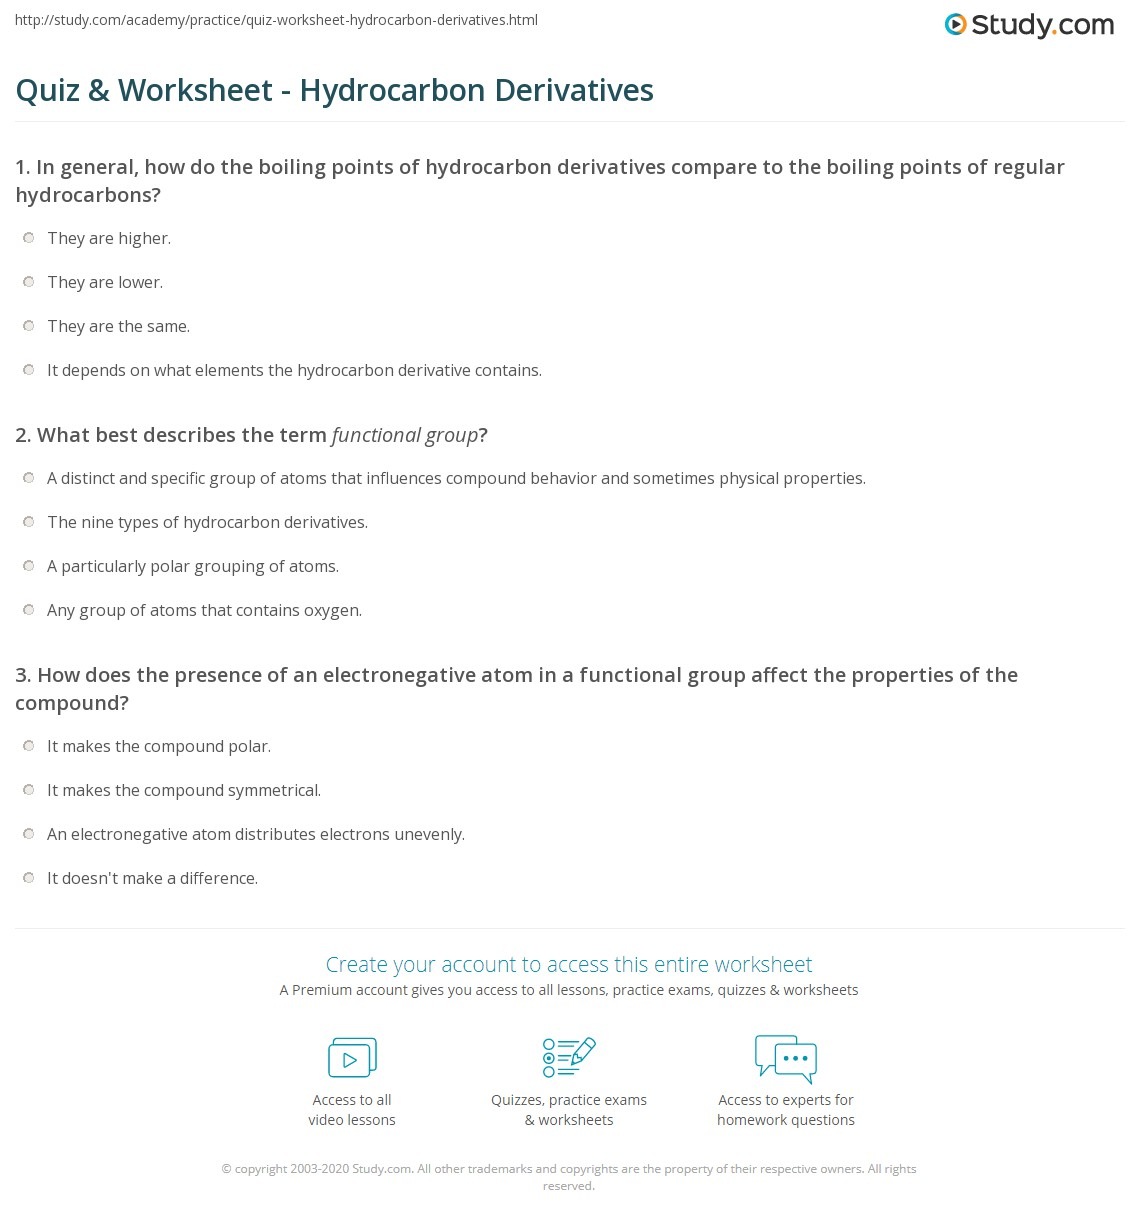 worksheet Derivative Practice Worksheet quiz worksheet hydrocarbon derivatives study com print definition properties worksheet